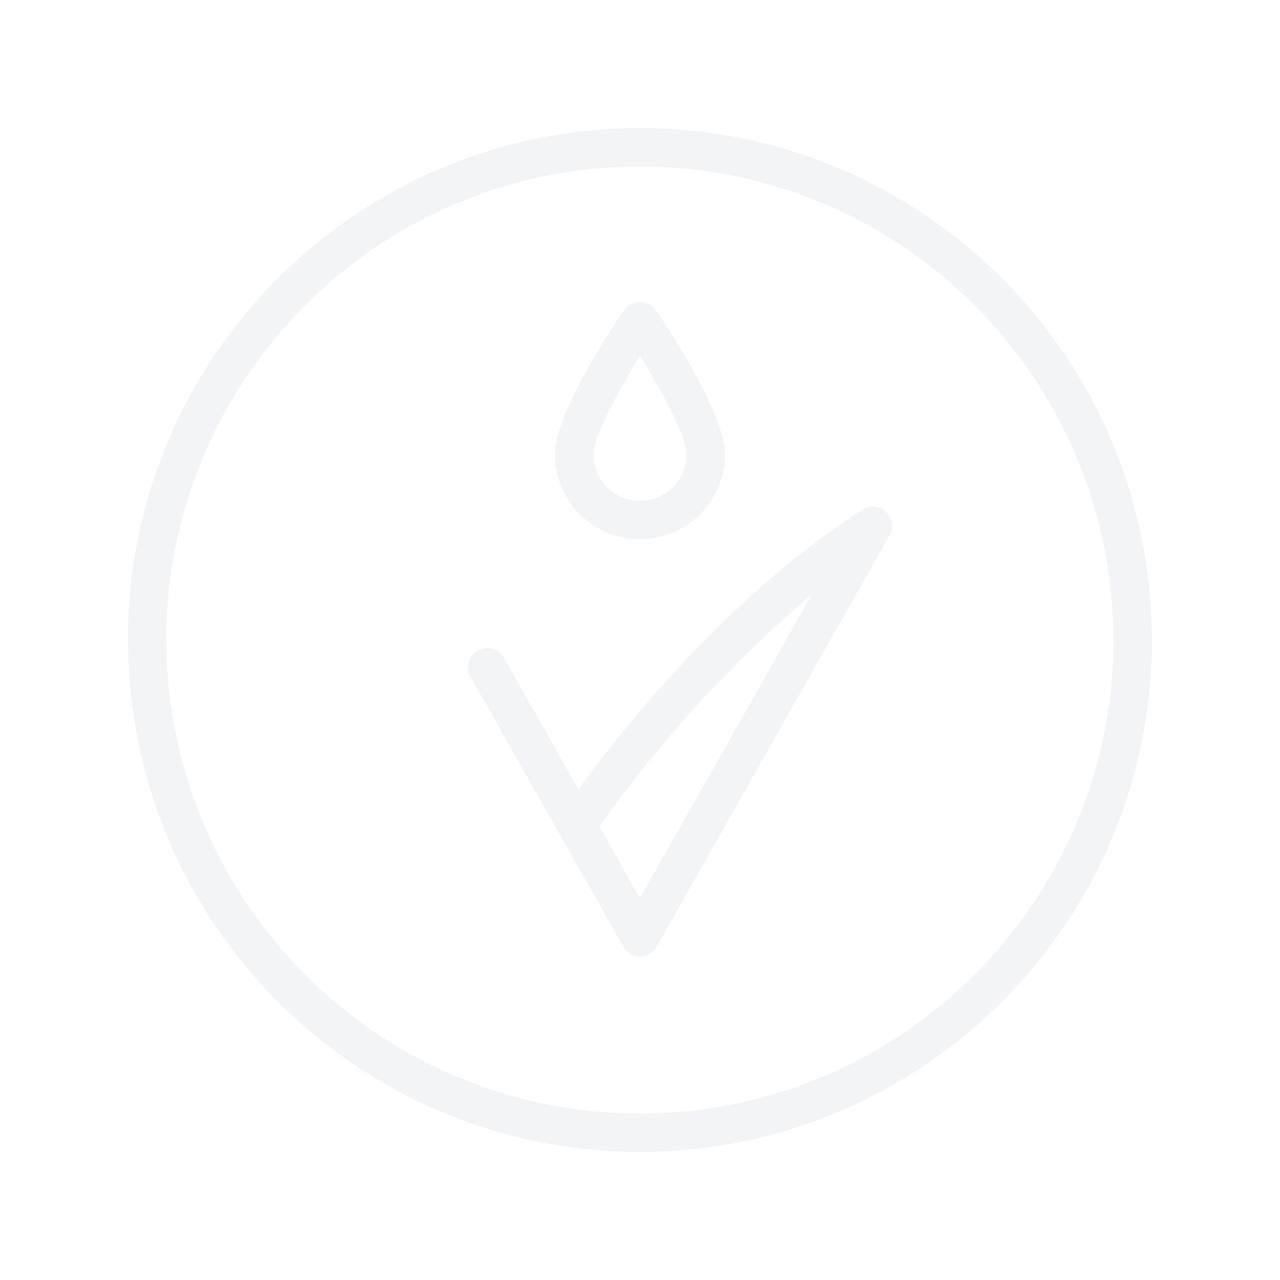 DR. HAUSCHKA Regenerating Complexion Day Cream 40ml